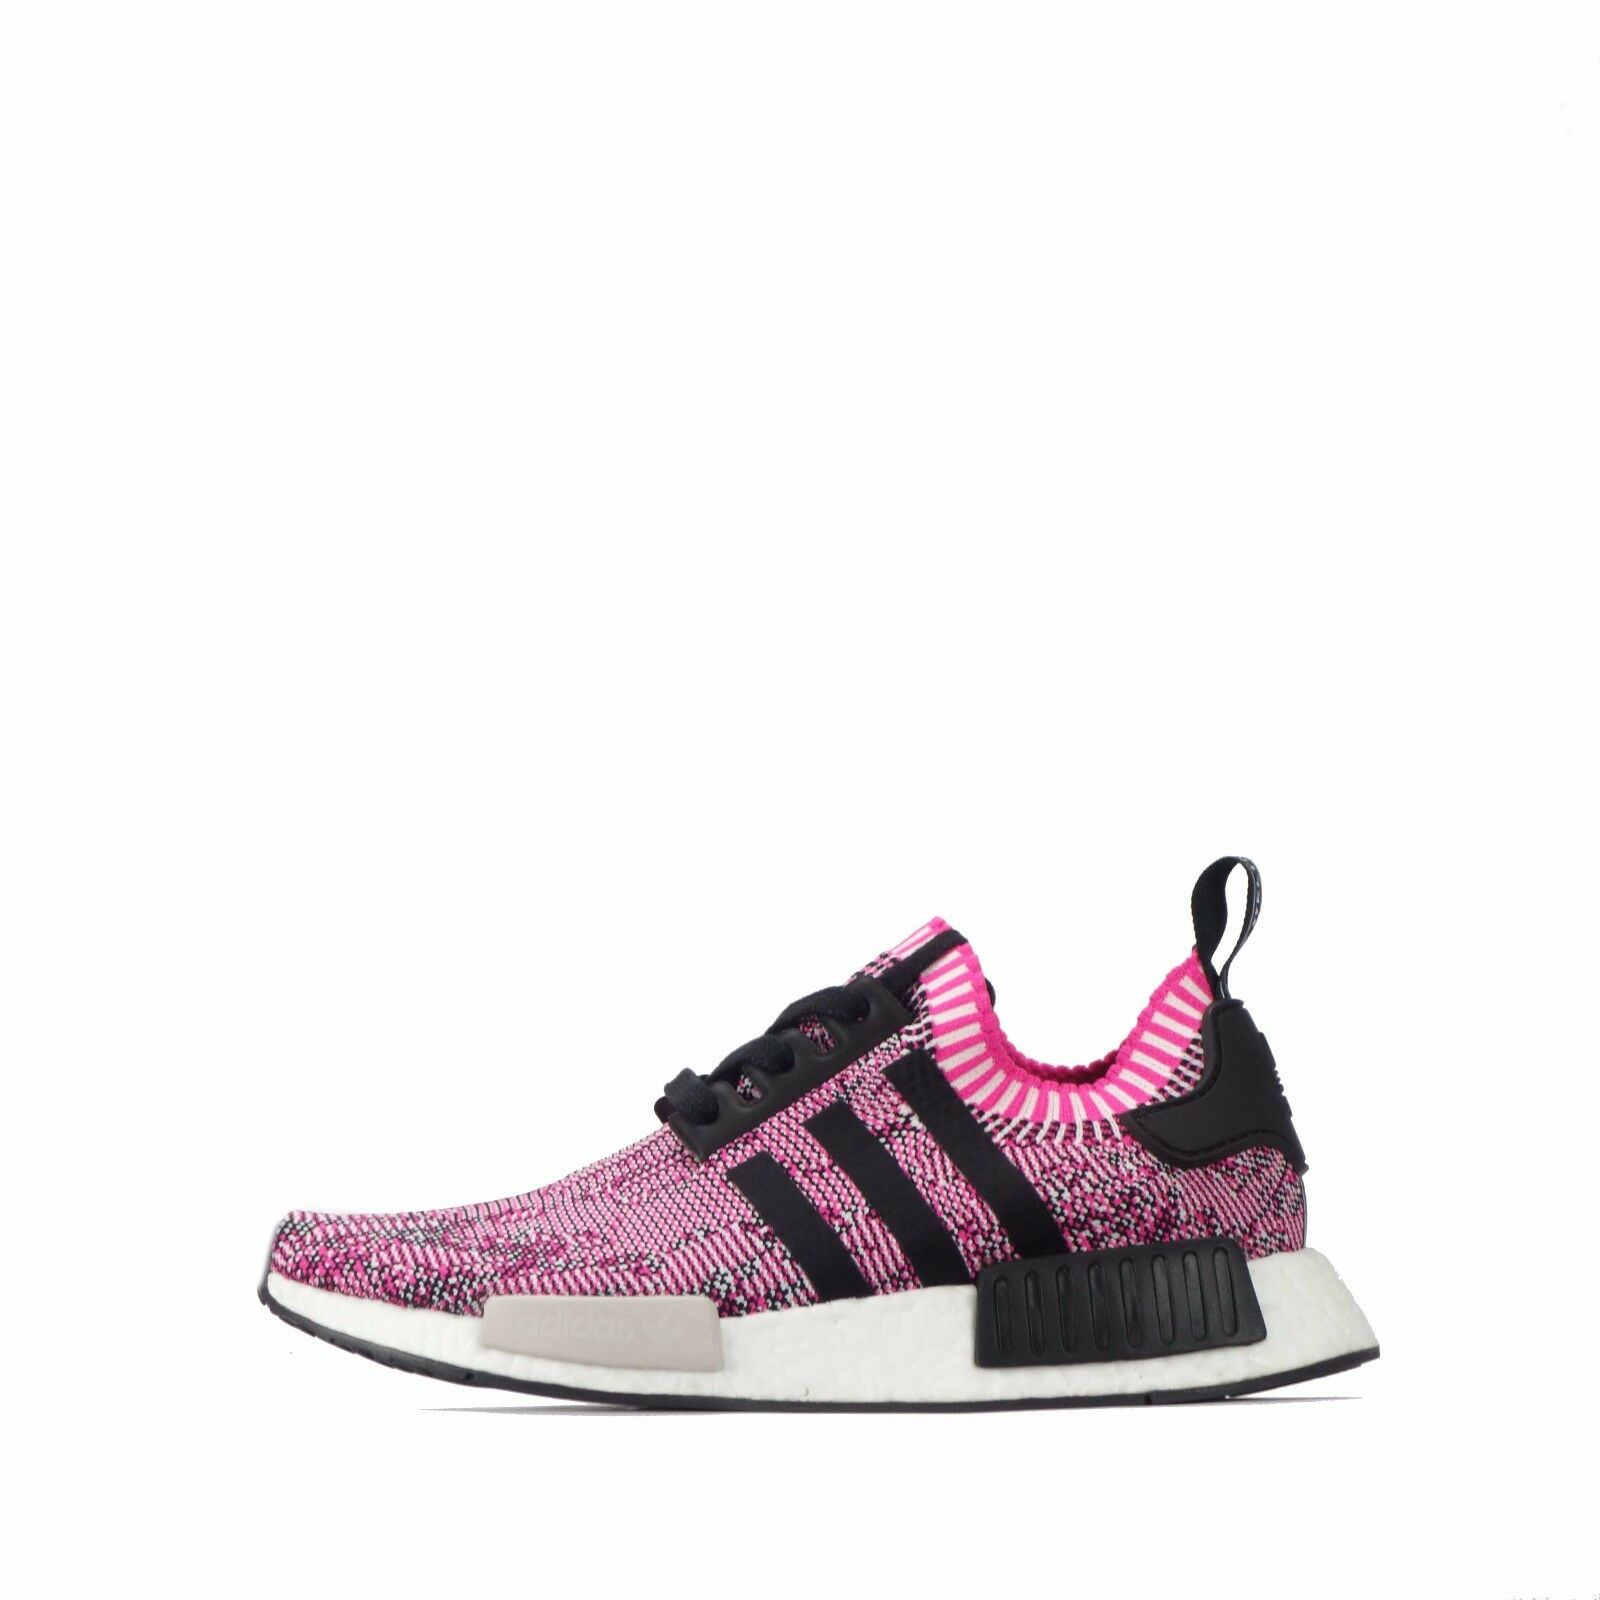 adidas nmd r1 primeknit rosa rosa bb2363 wmns scarpe ebay